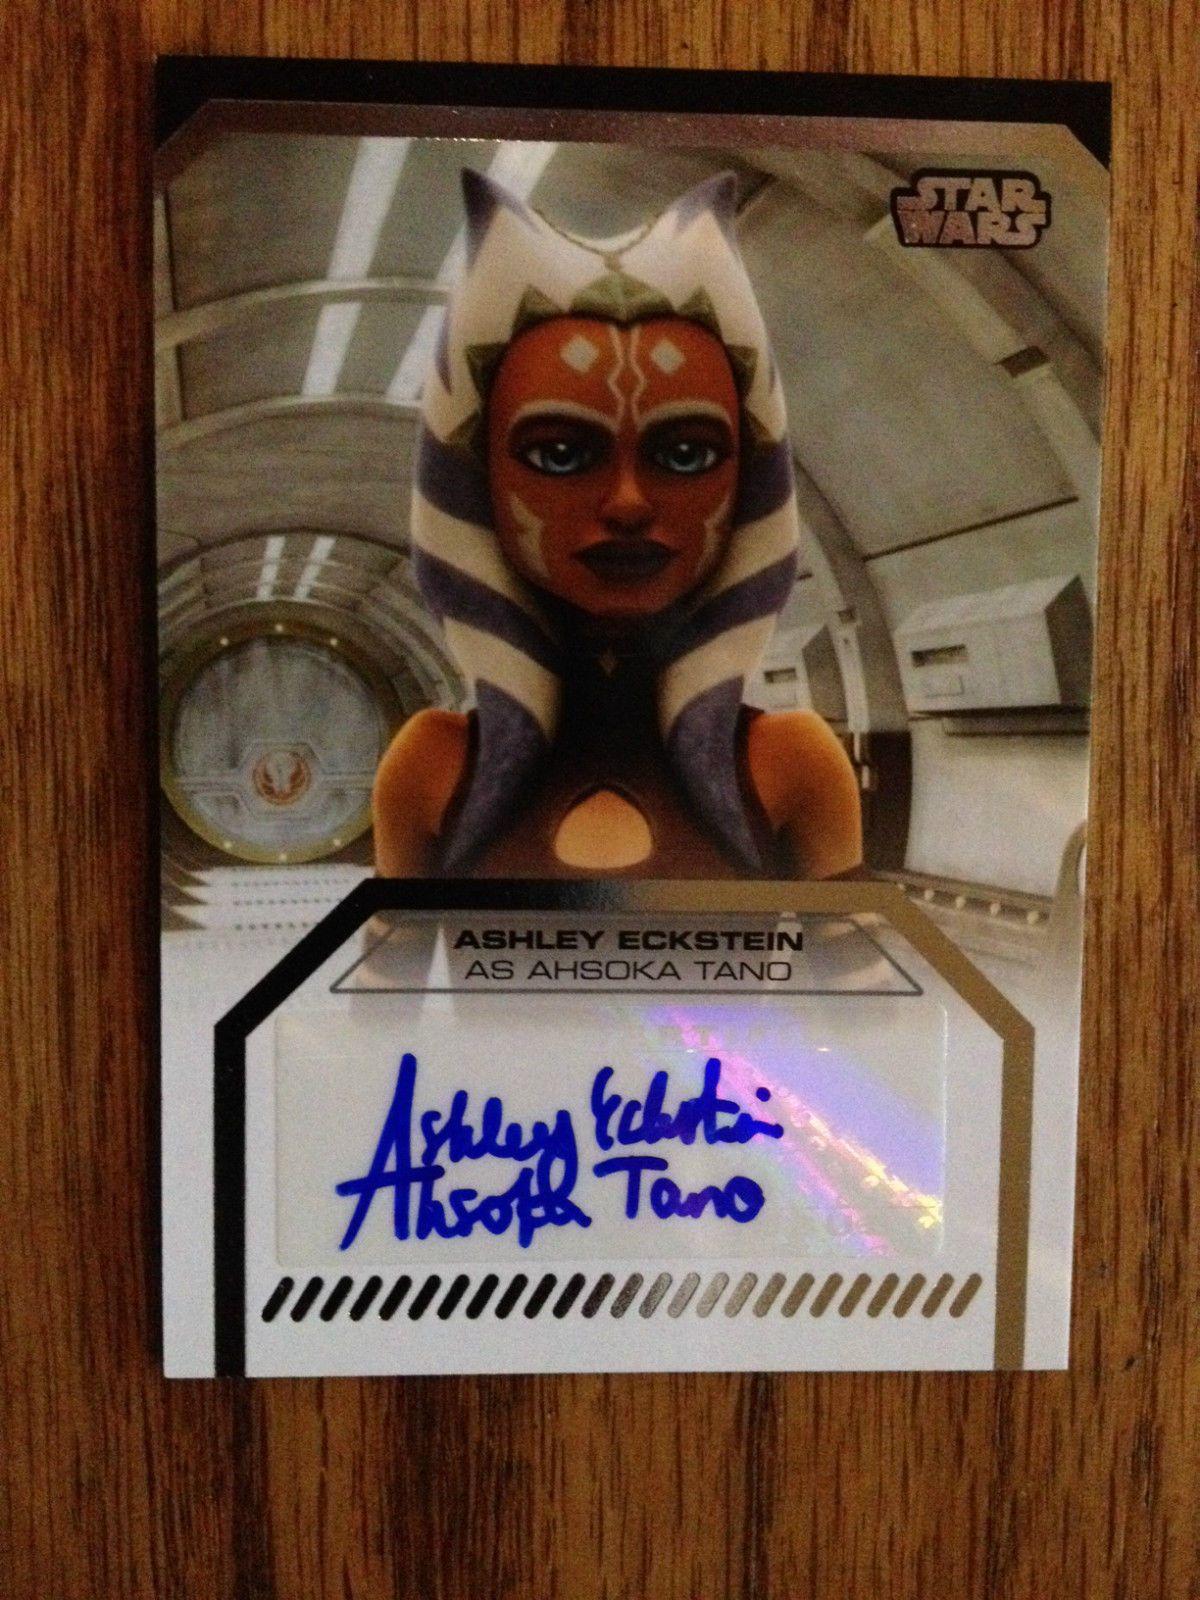 NEW! Topps STAR WARS Galactic Files 2 ASHLEY ECKSTEIN AHSOKA Autograph Card Auto